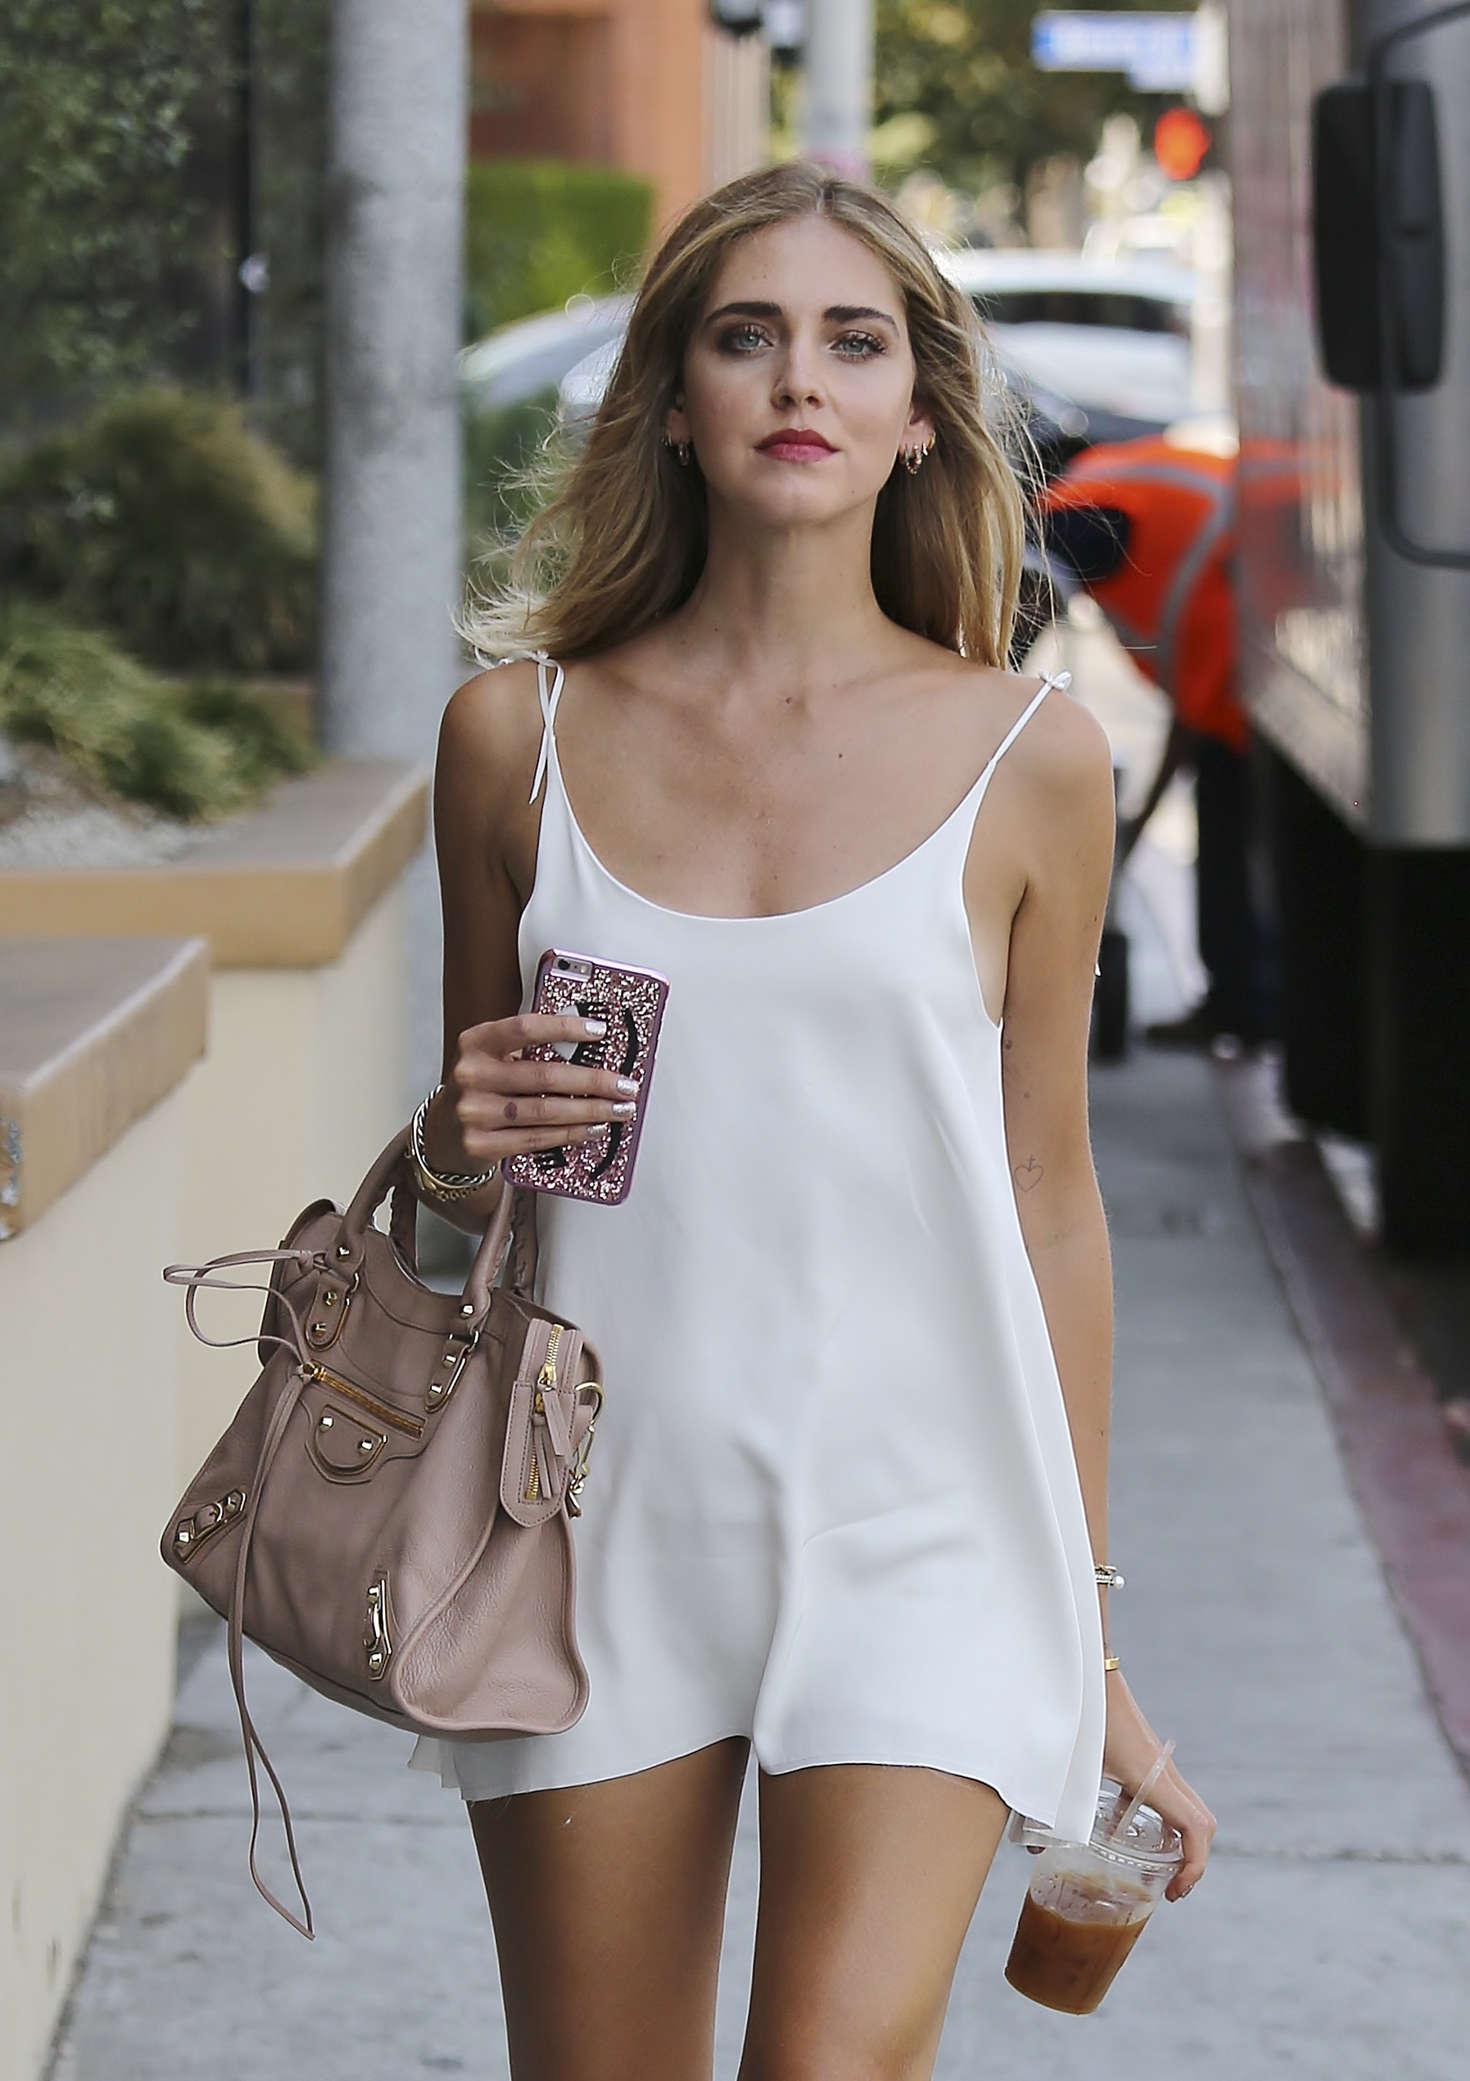 Chiara Ferragni in Mini Dress out in Los Angeles – GotCeleb